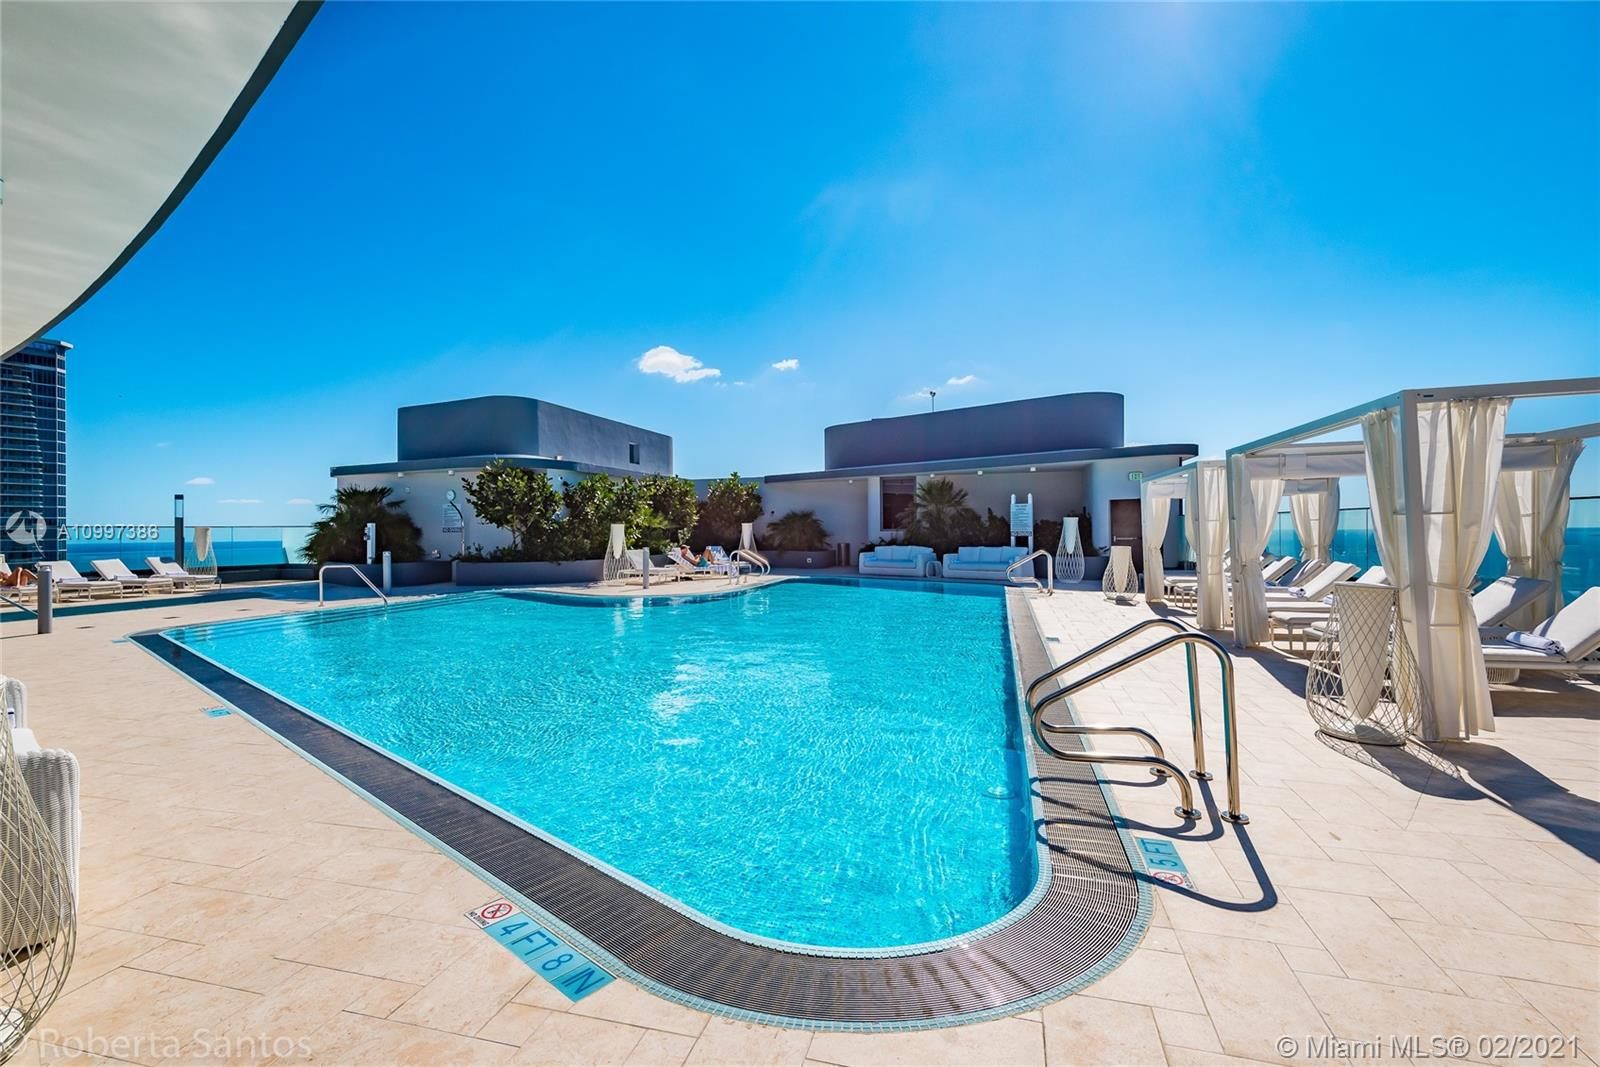 Brickell FlatIron #5801 - 1000 Brickell Plaza #5801, Miami, FL 33131